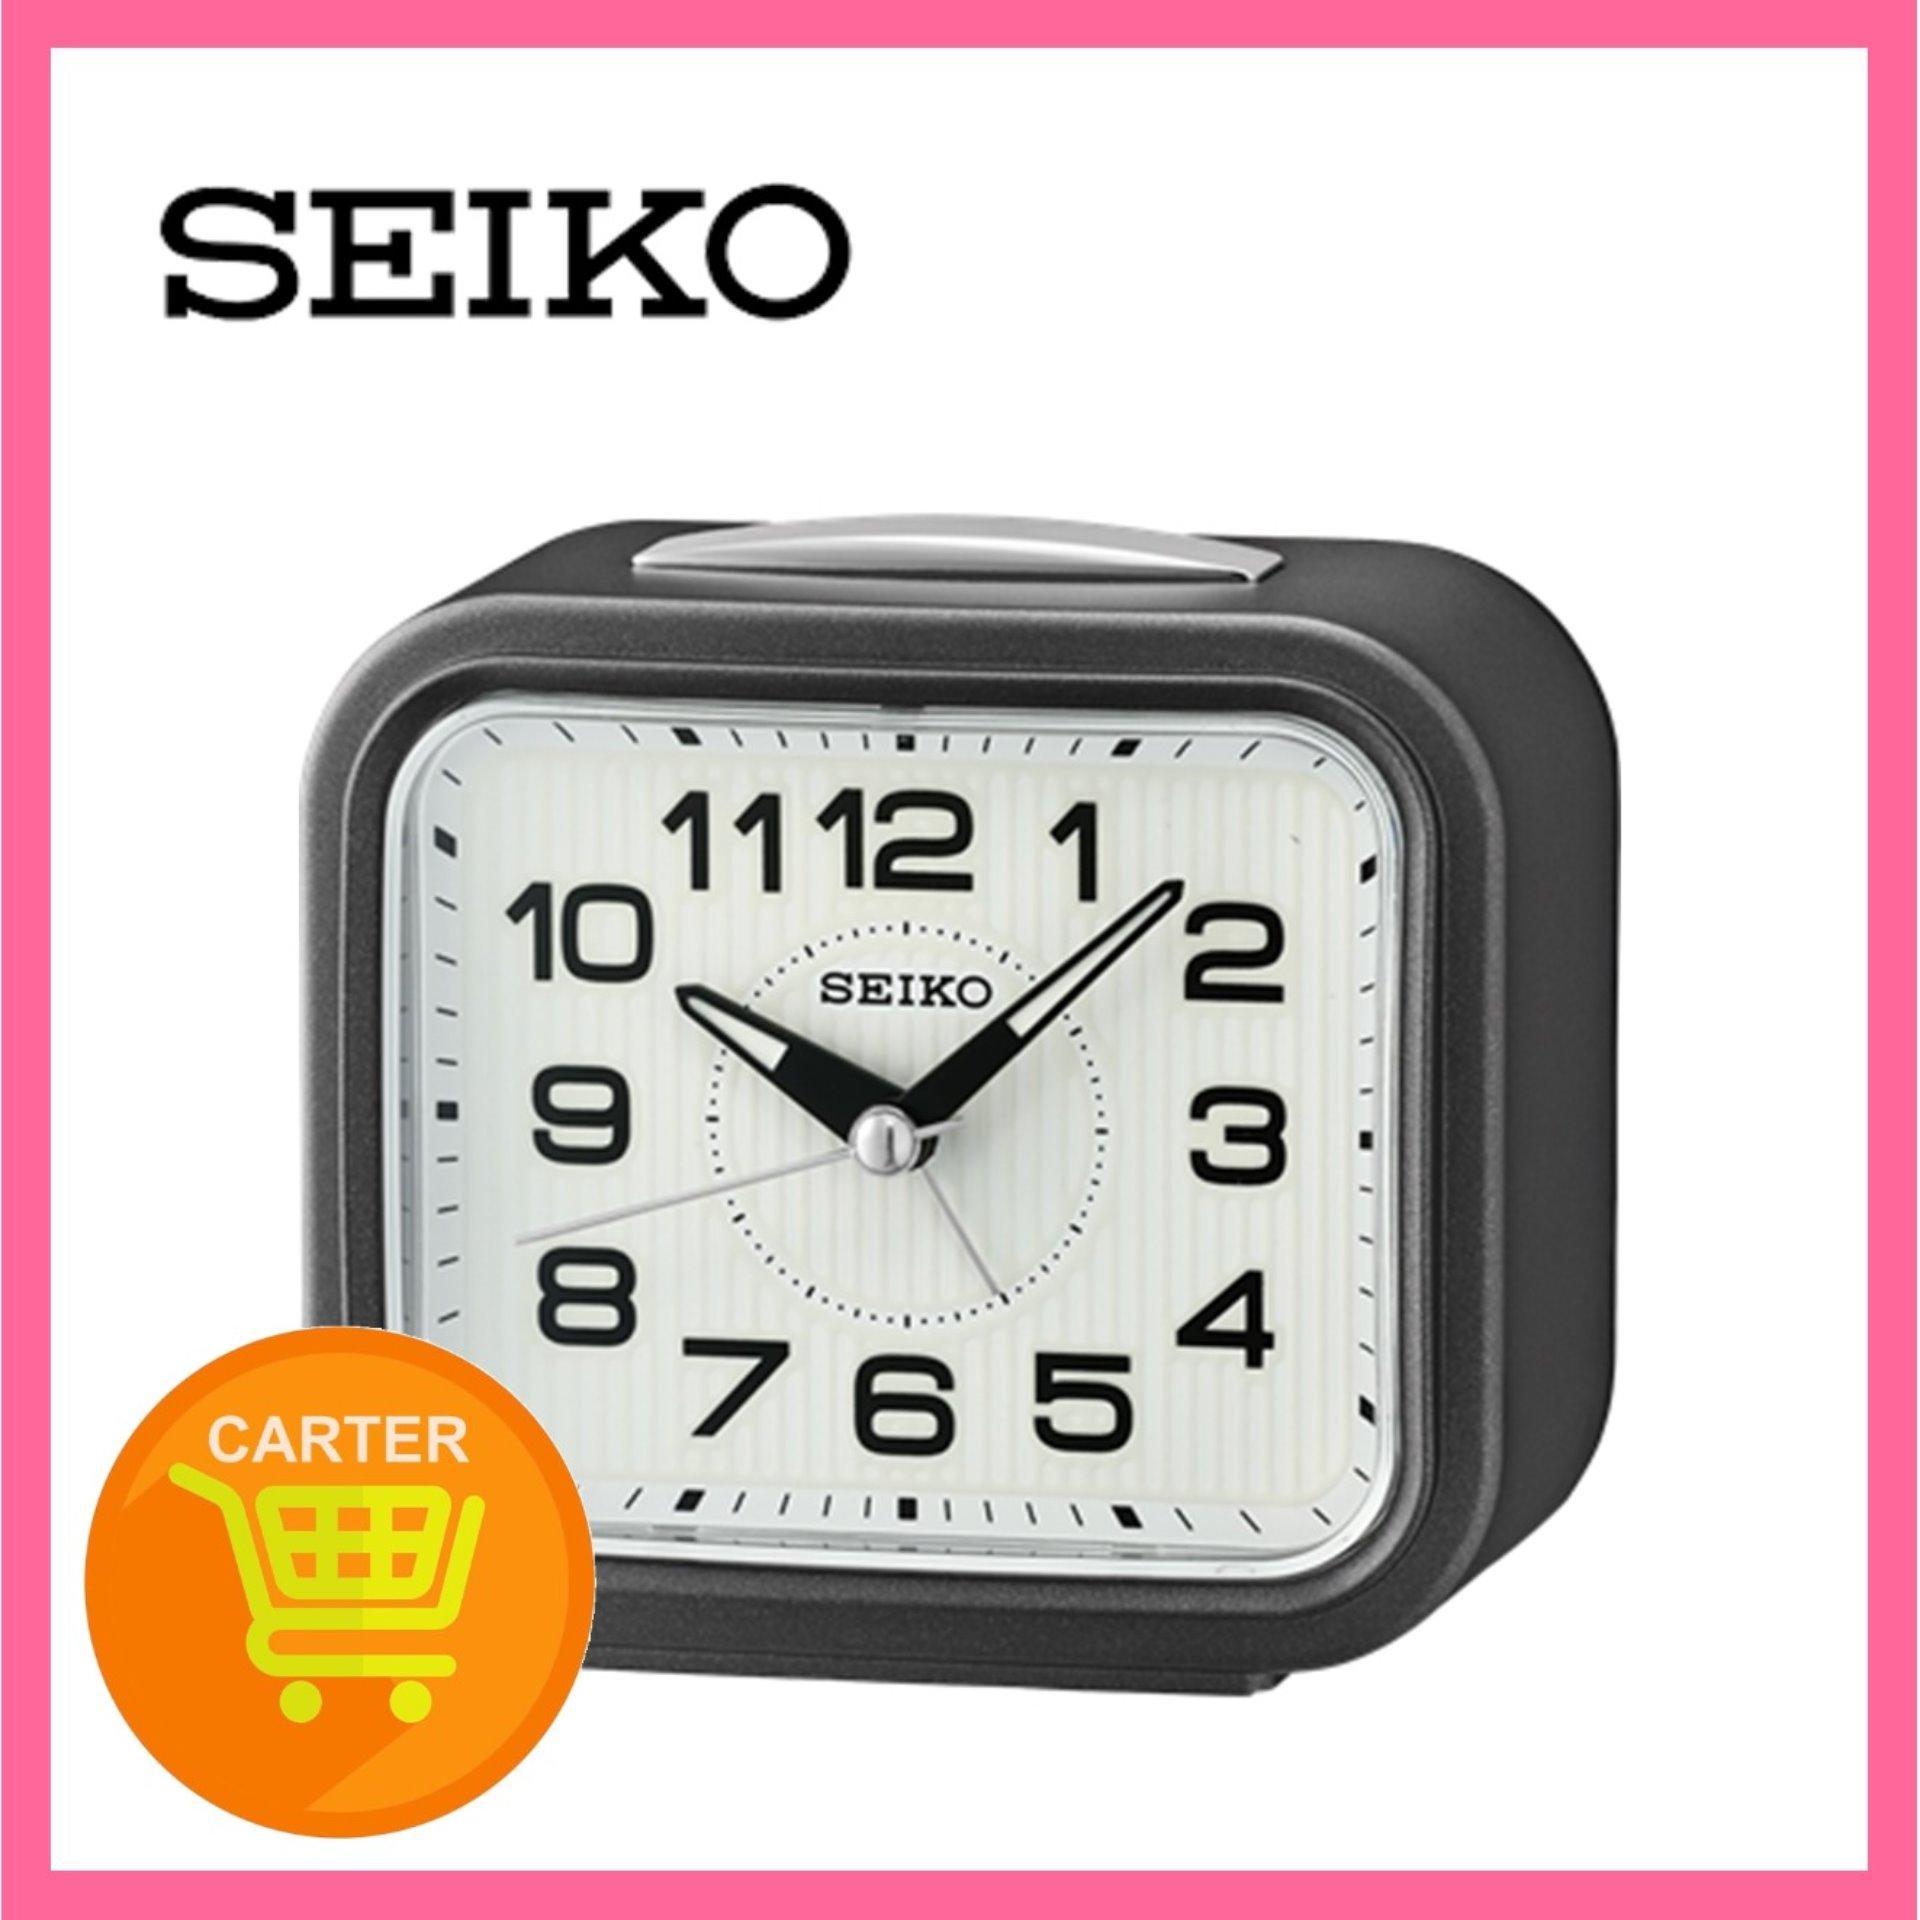 SEIKO SILENT MOVEMENT ALARM CLOCK (BELL+SNOOZE+LIGHT+LUMIBRITE) QHK050 BLACK